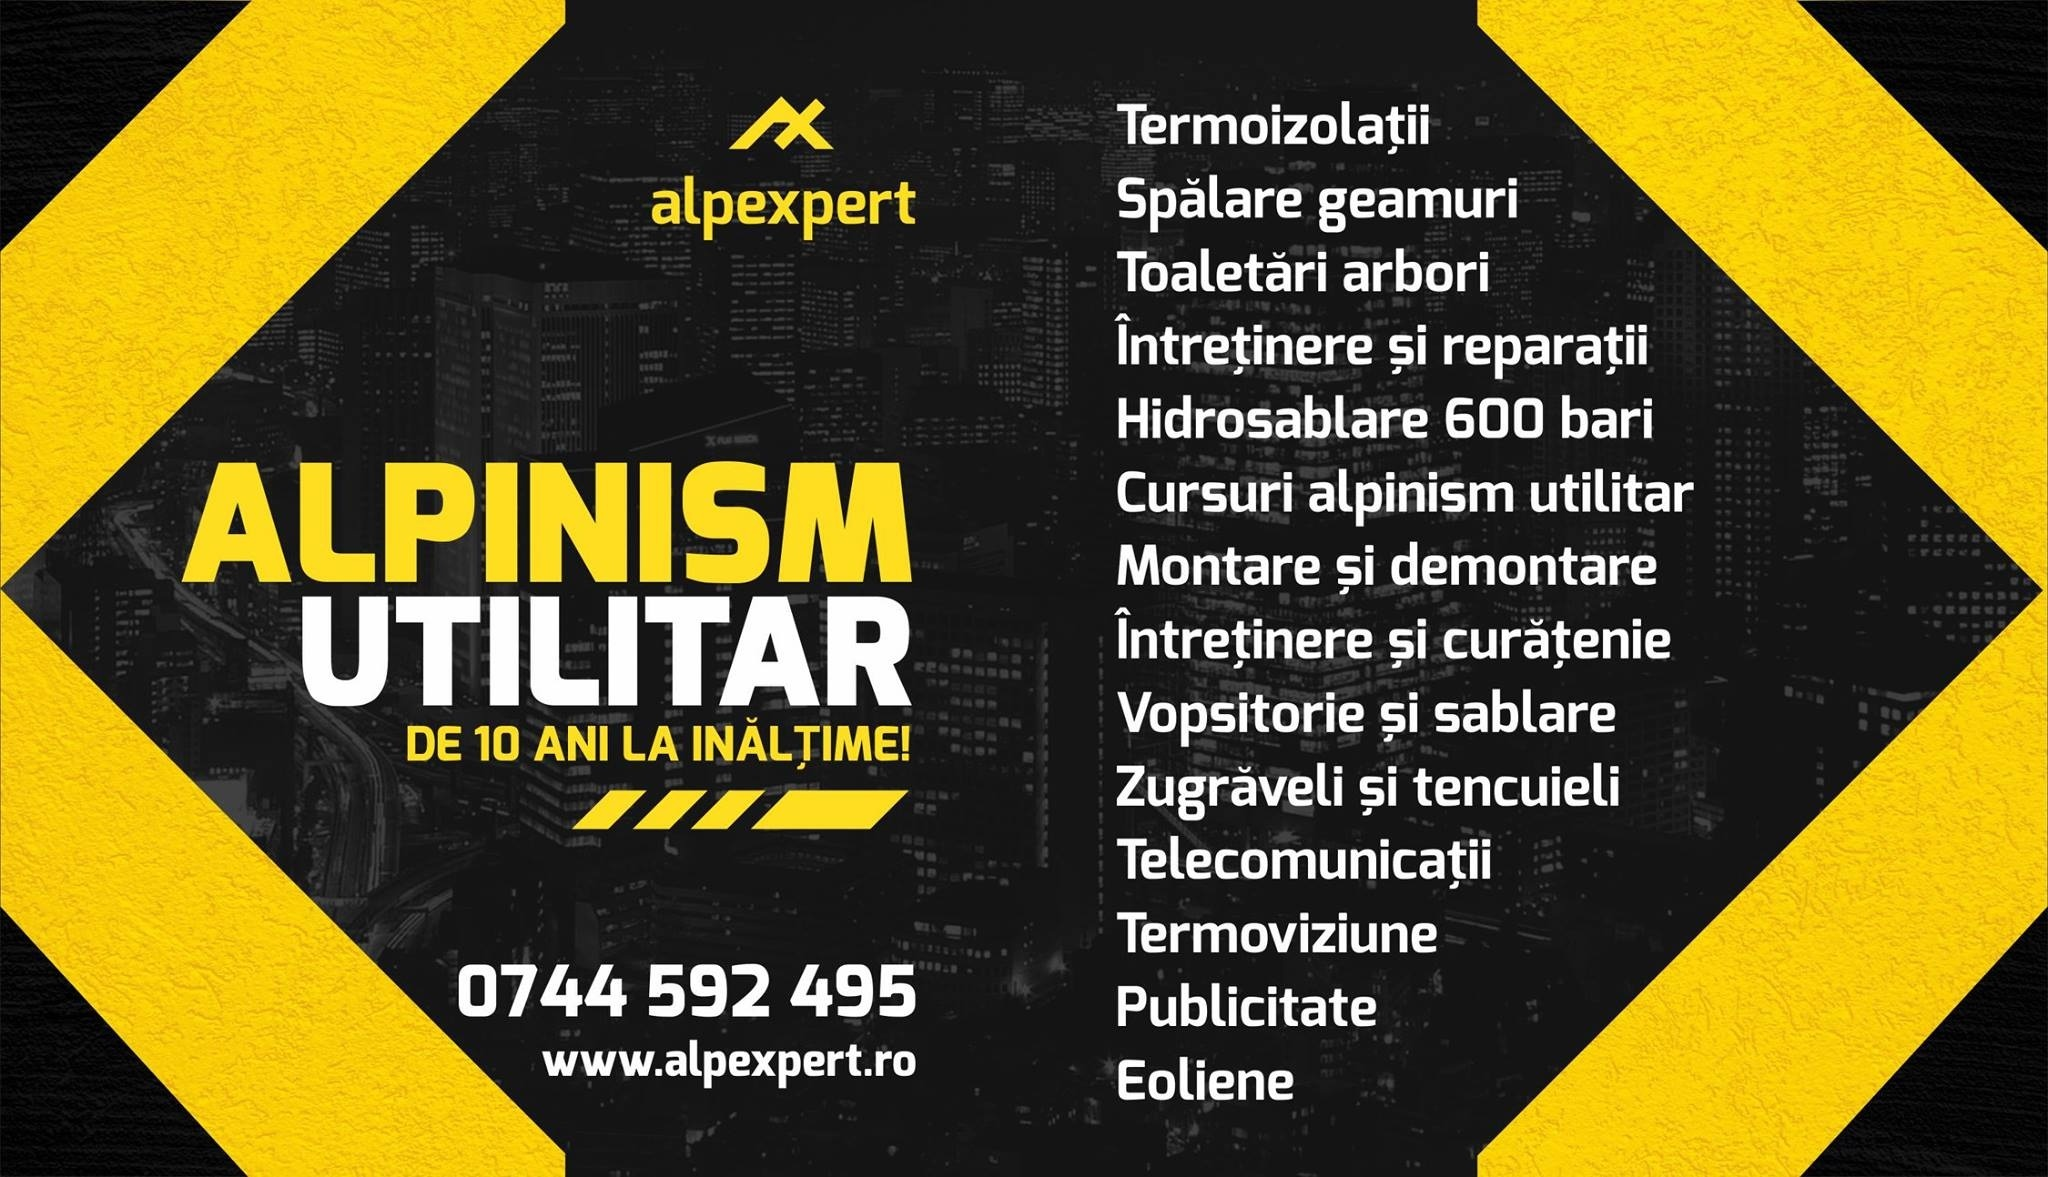 servicii_alpinism_utilitar_brasov